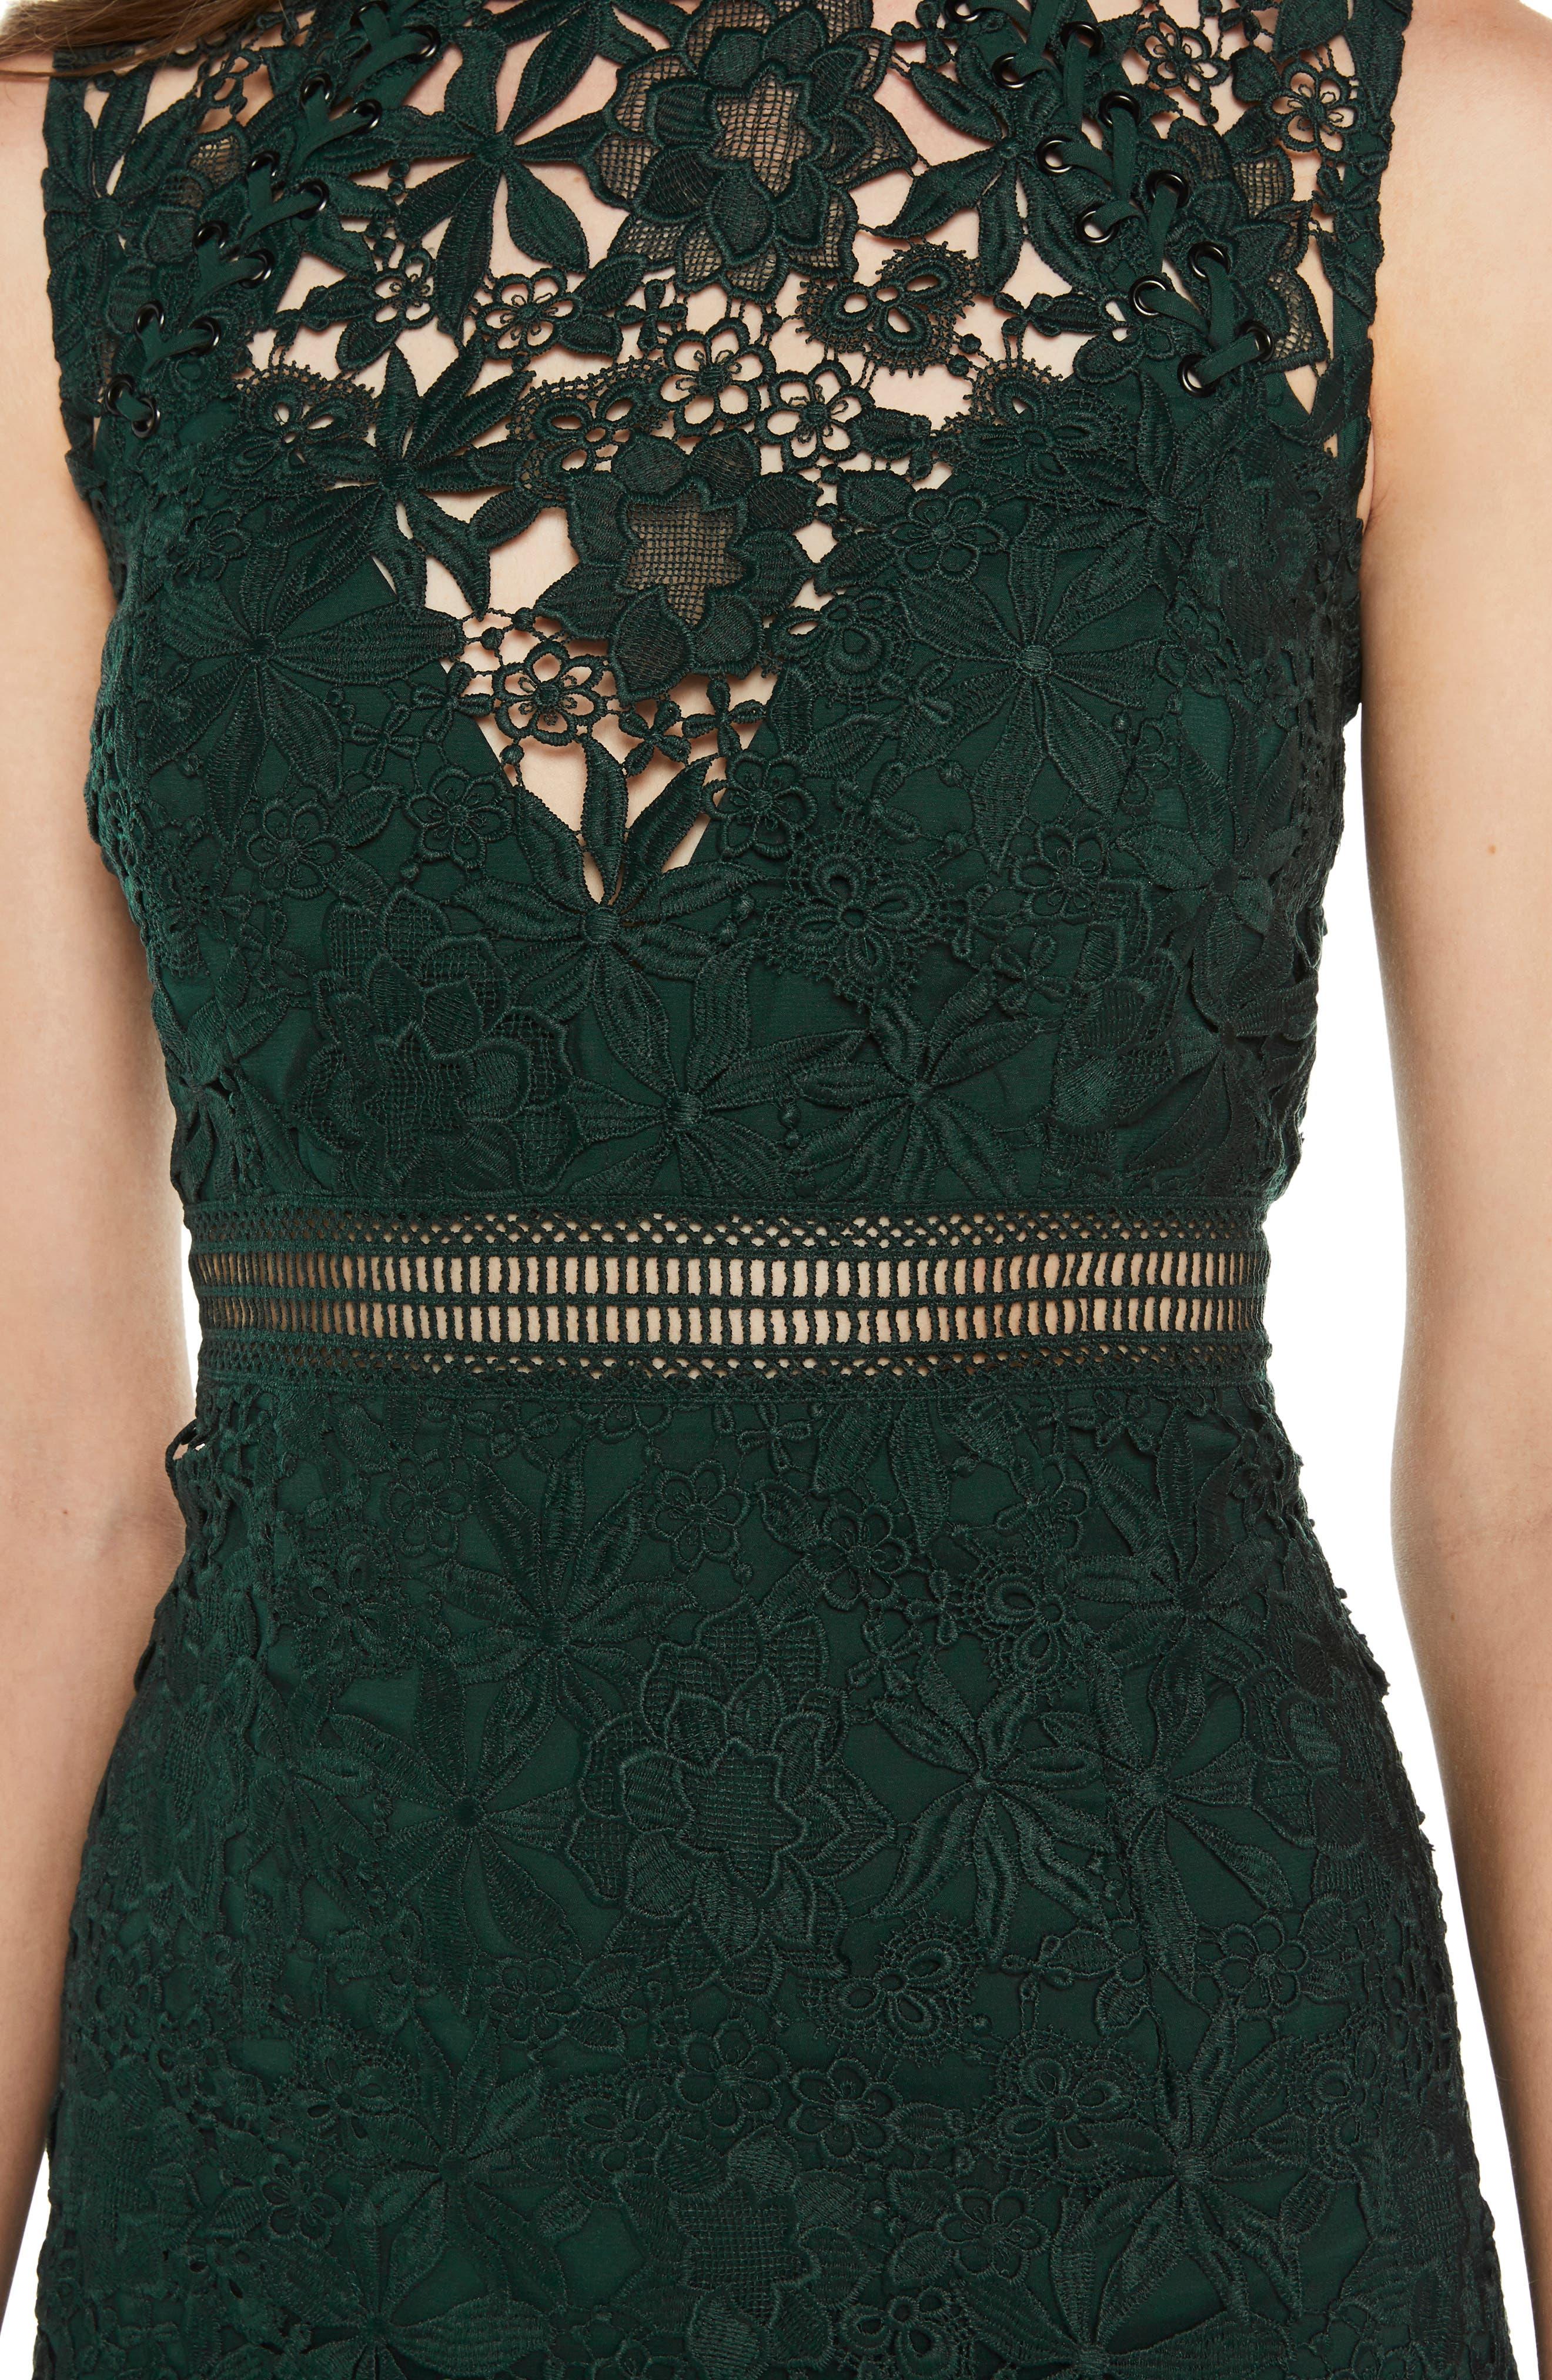 Paris Lace Body-Con Dress,                             Alternate thumbnail 4, color,                             FOREST GREEN